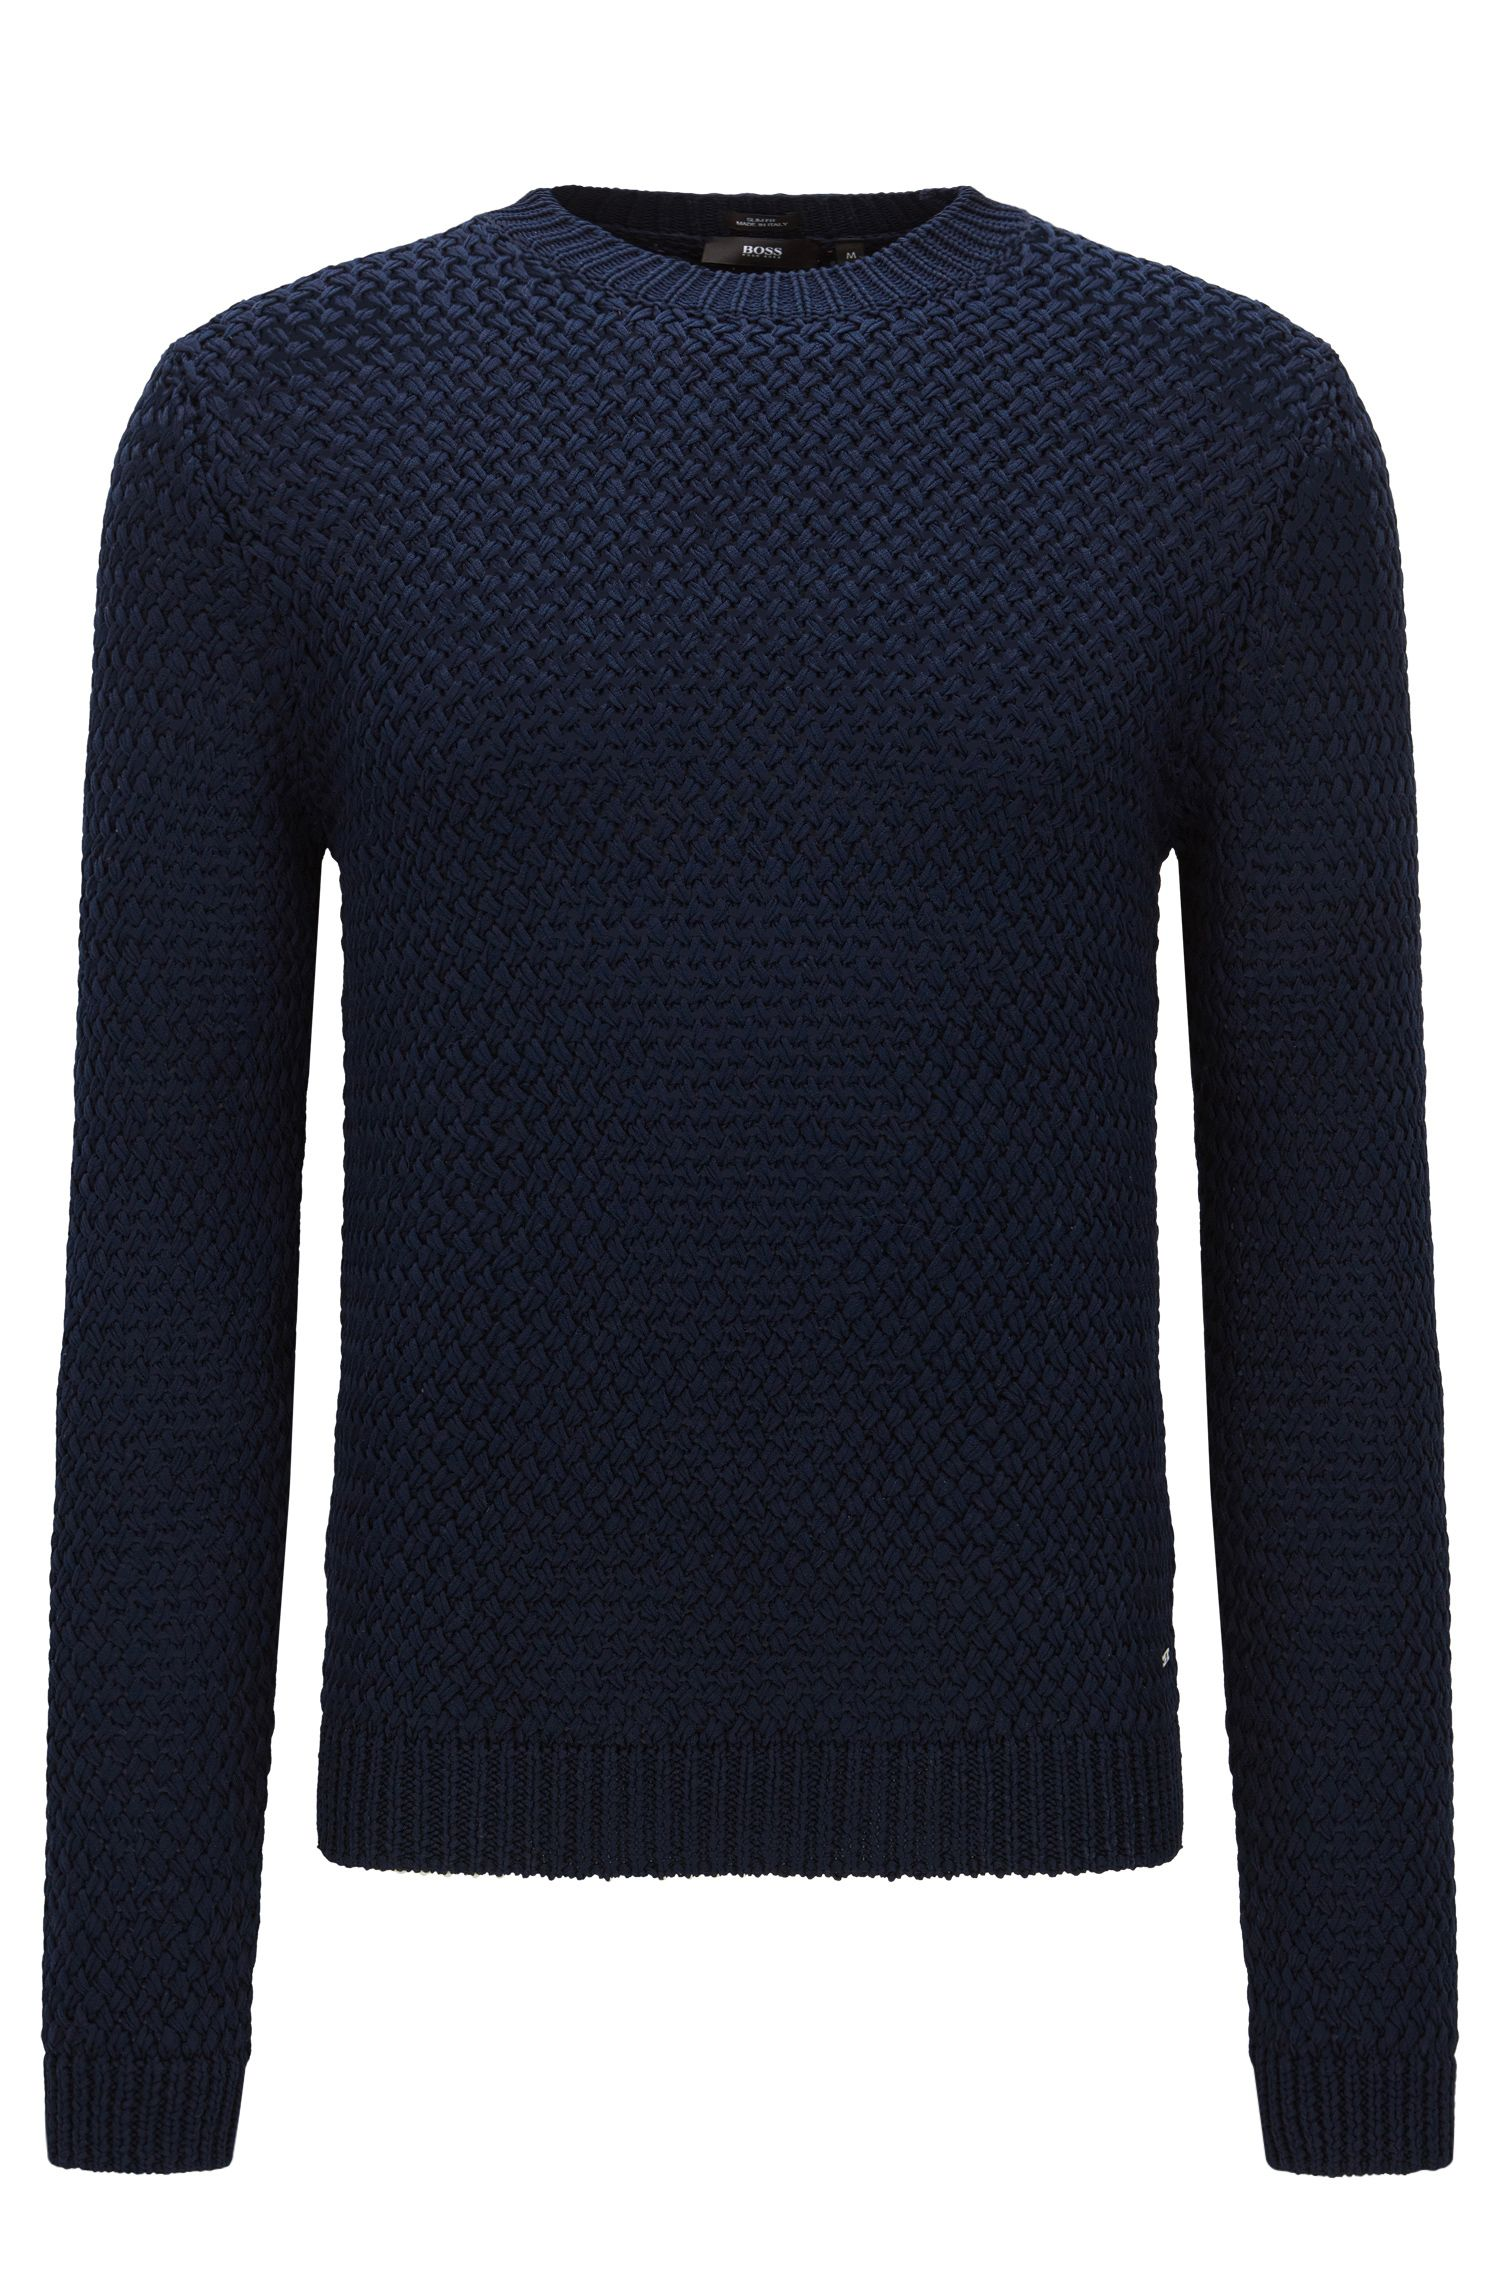 Plain-coloured slim-fit sweater in cotton: 'Olex'